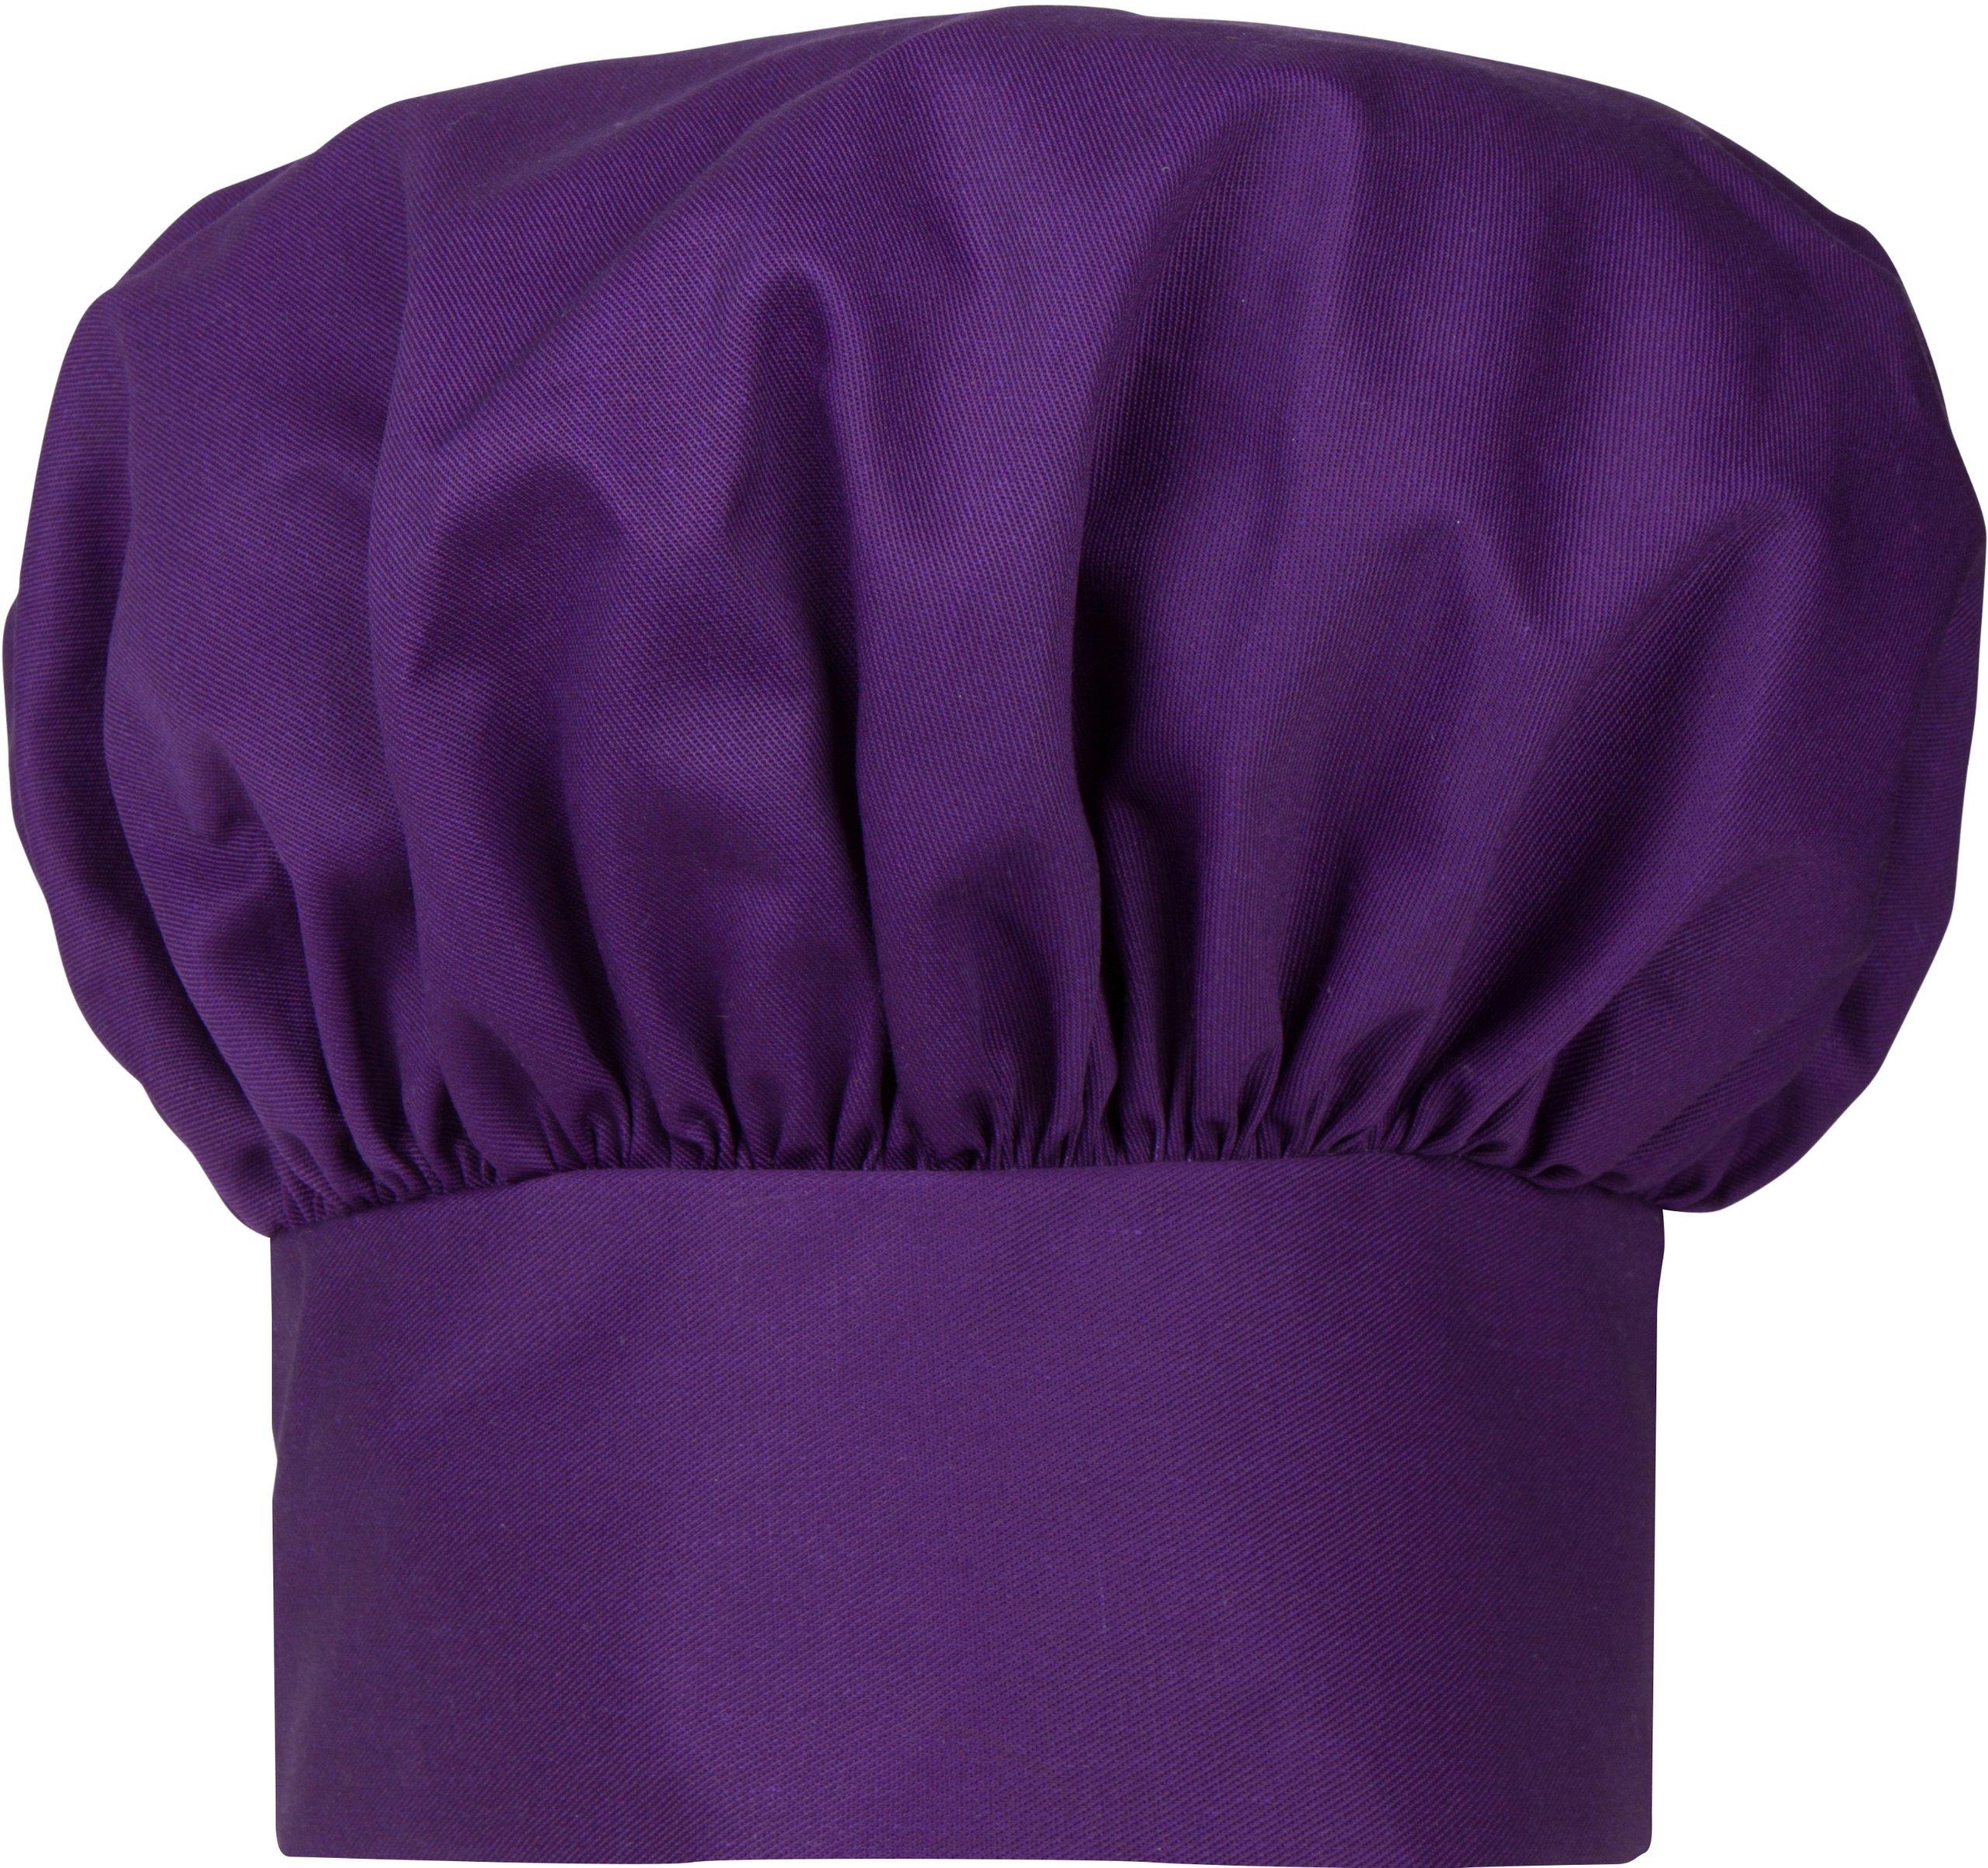 Phoenix Chef's Hat with Velcro Close, Purple by Phoenix